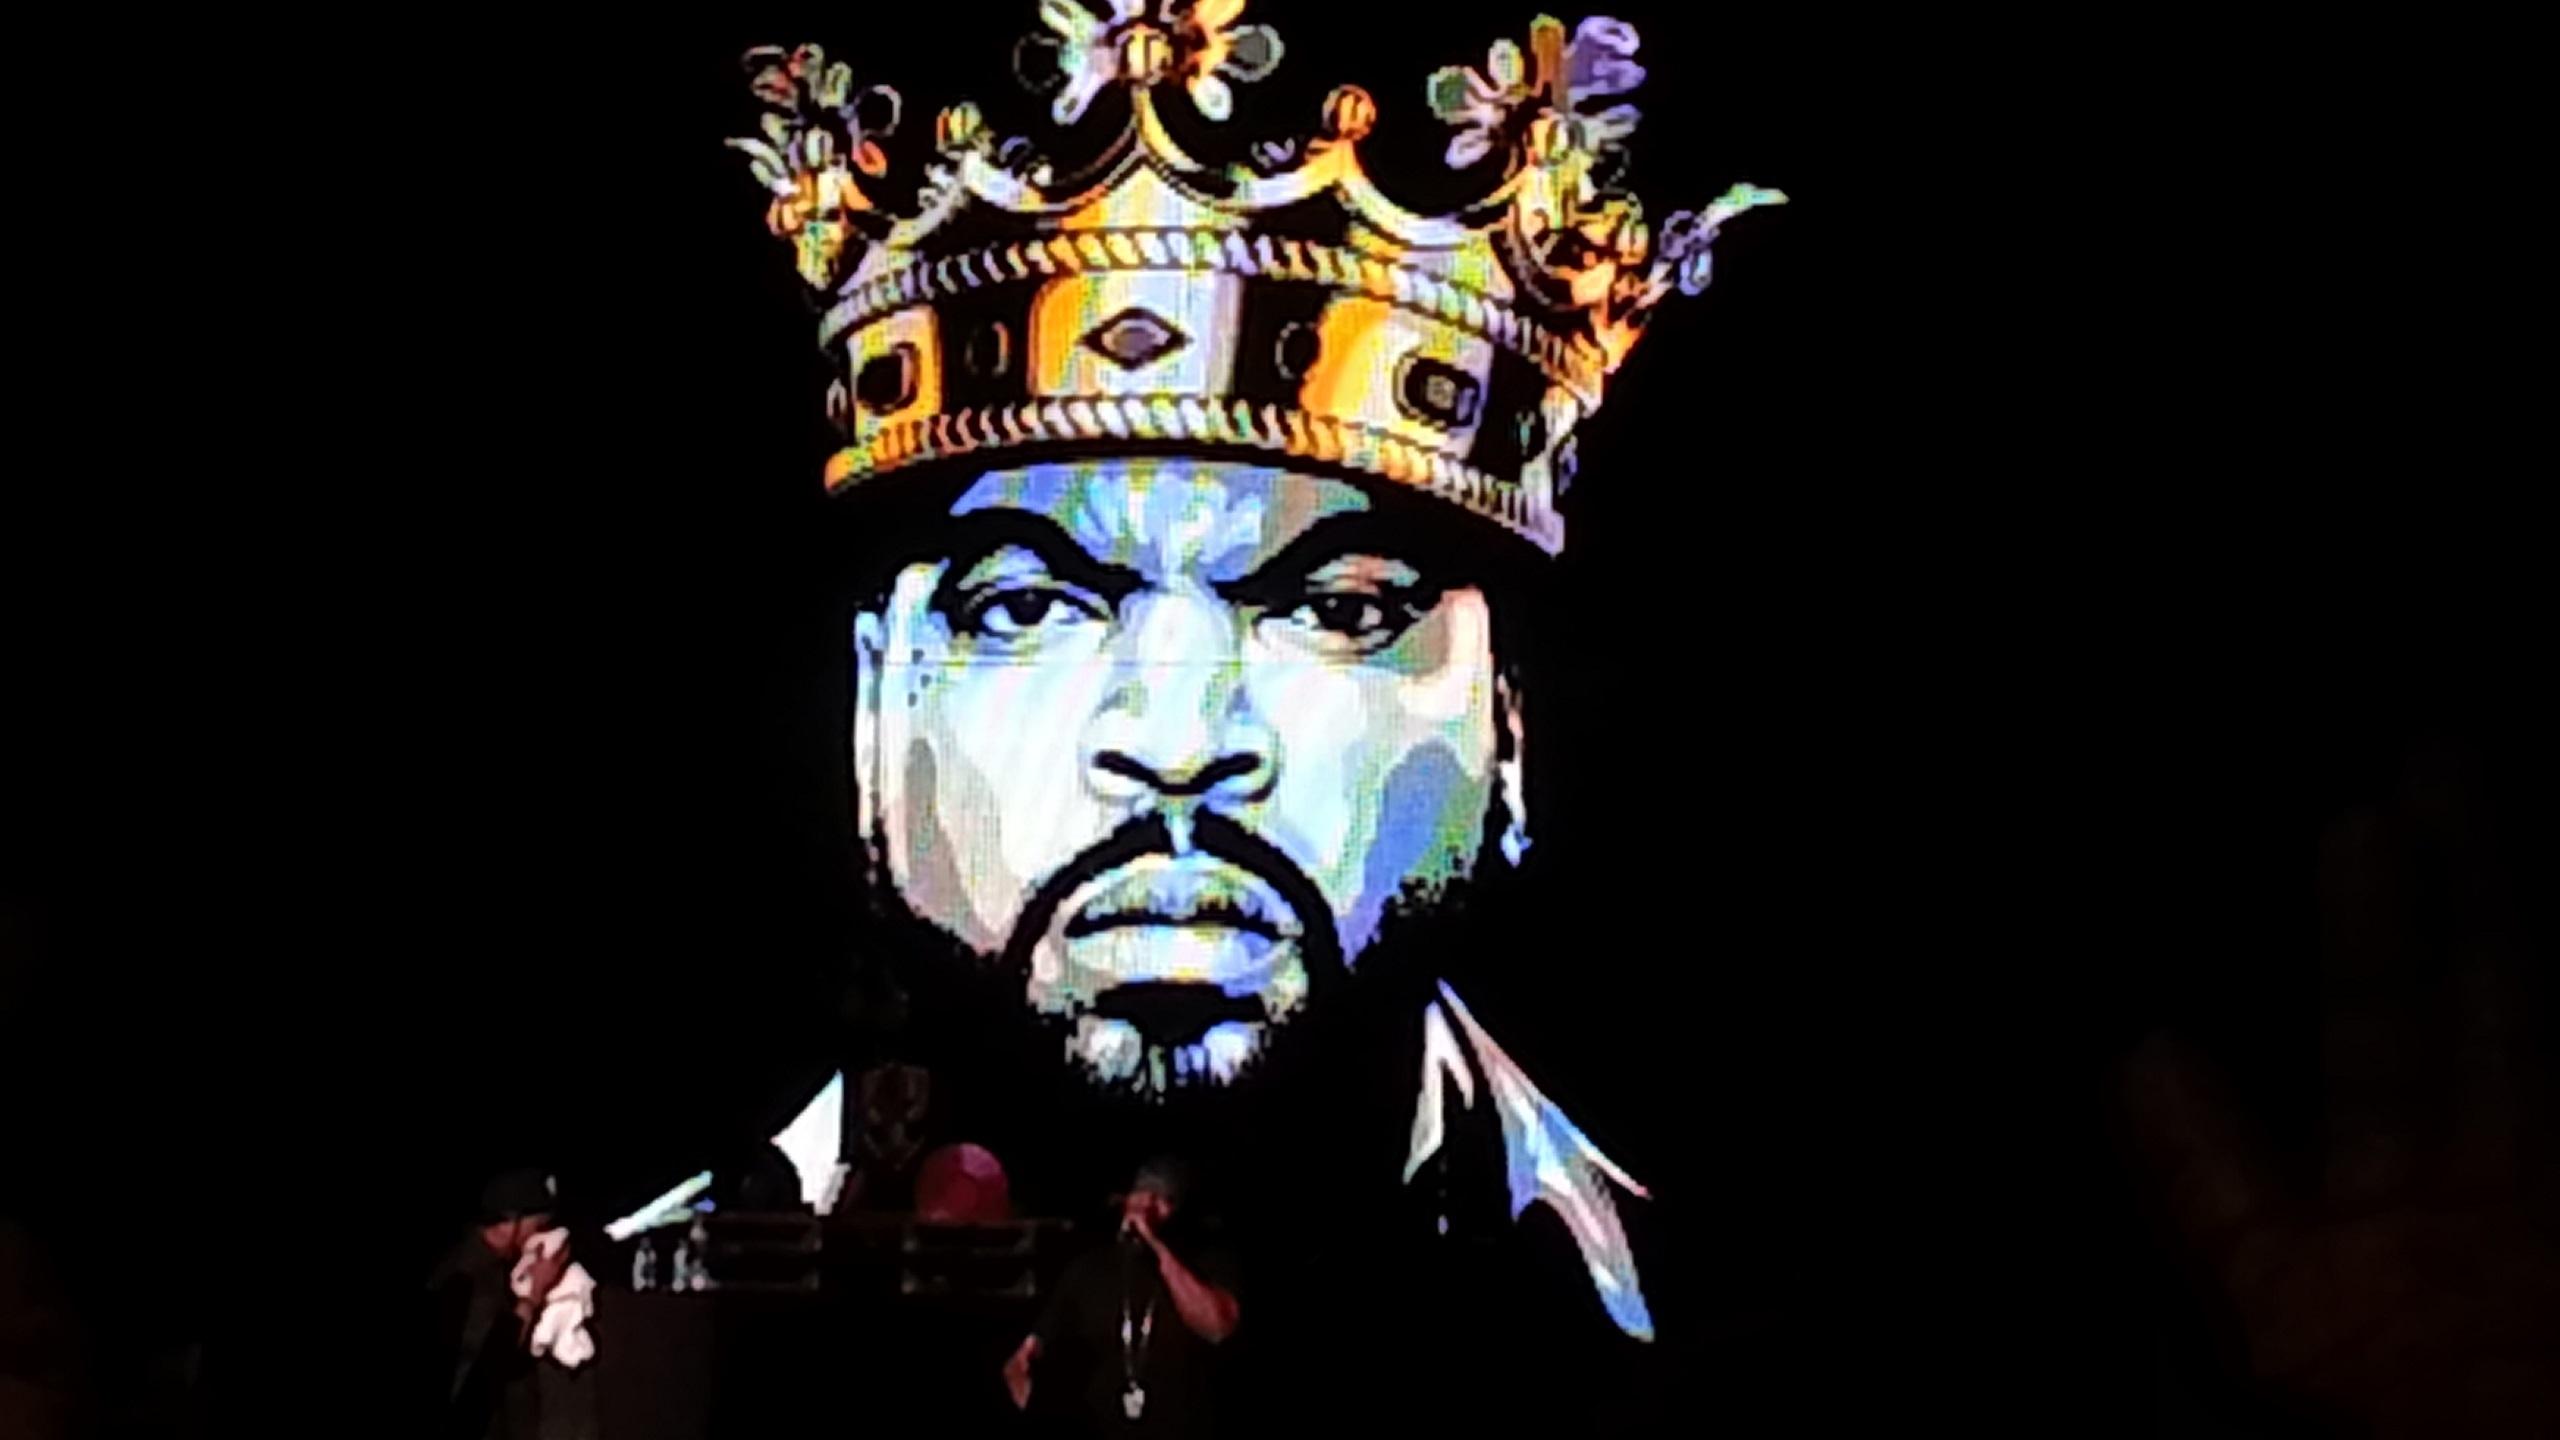 HD Hip Hop Backgrounds 2560x1440